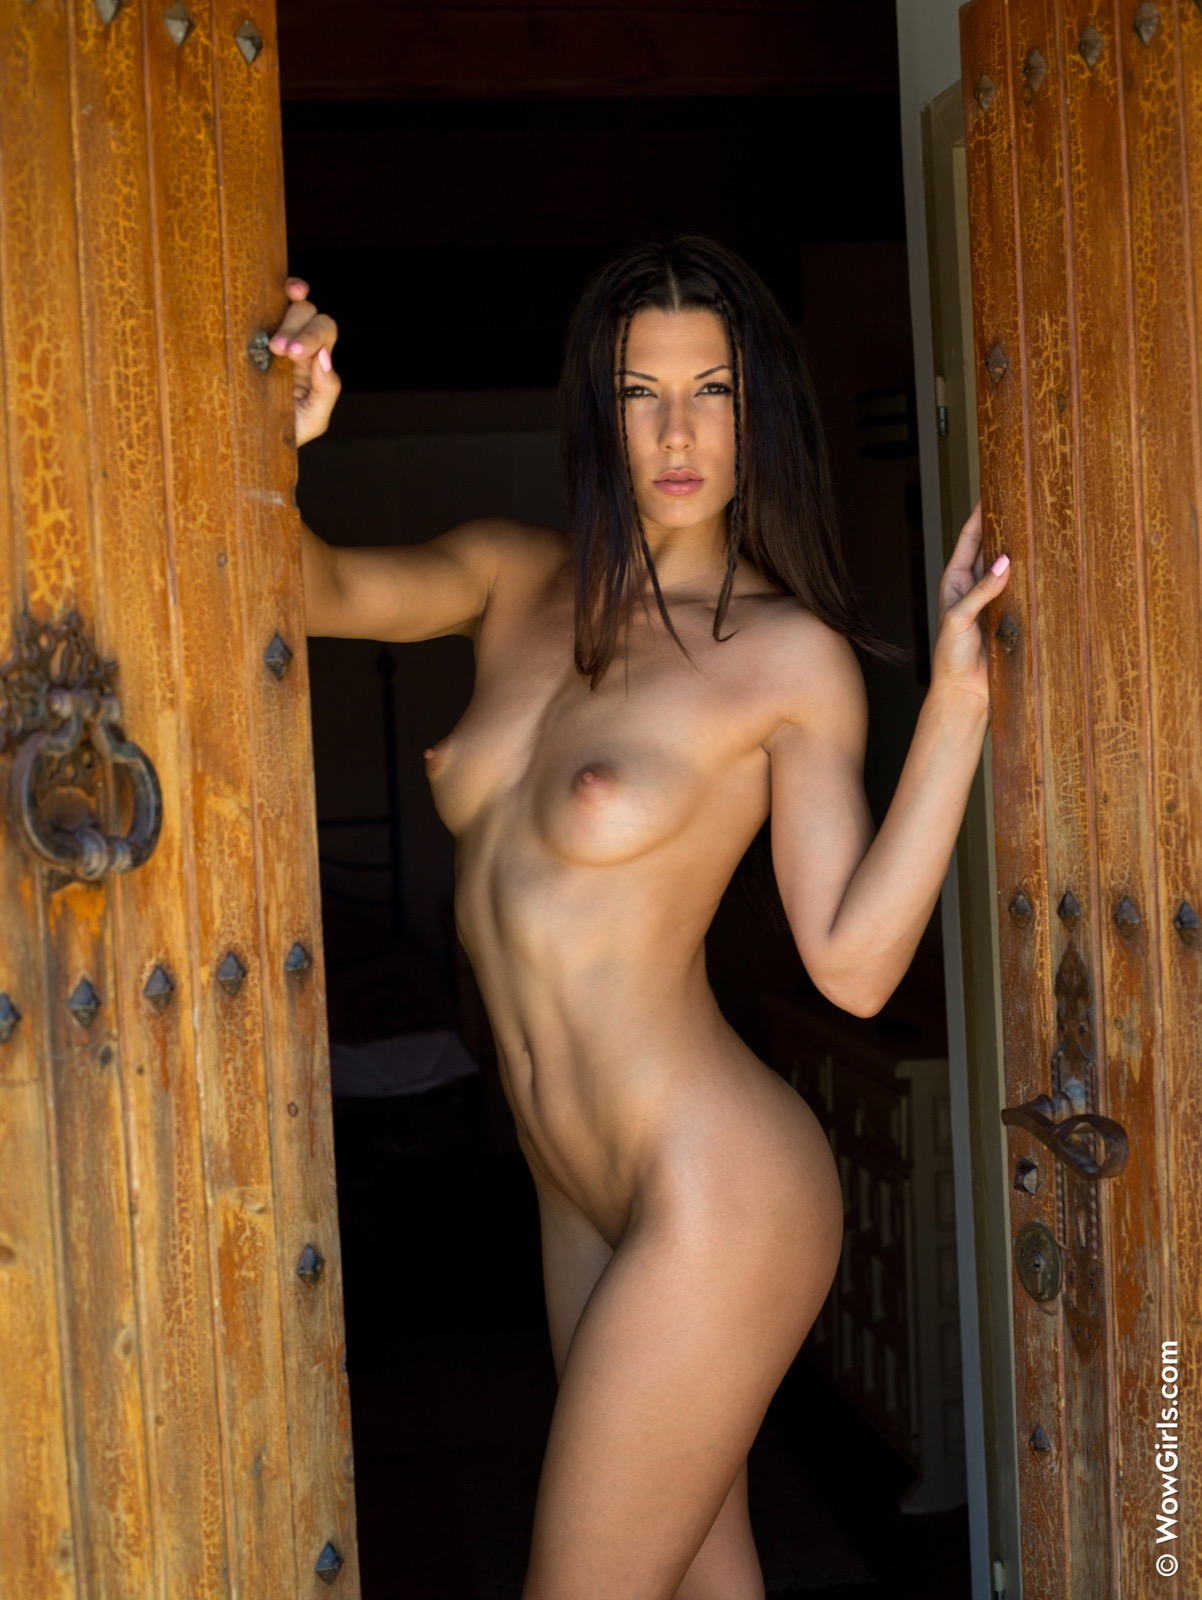 alexa_tomas_28849_4.jpg